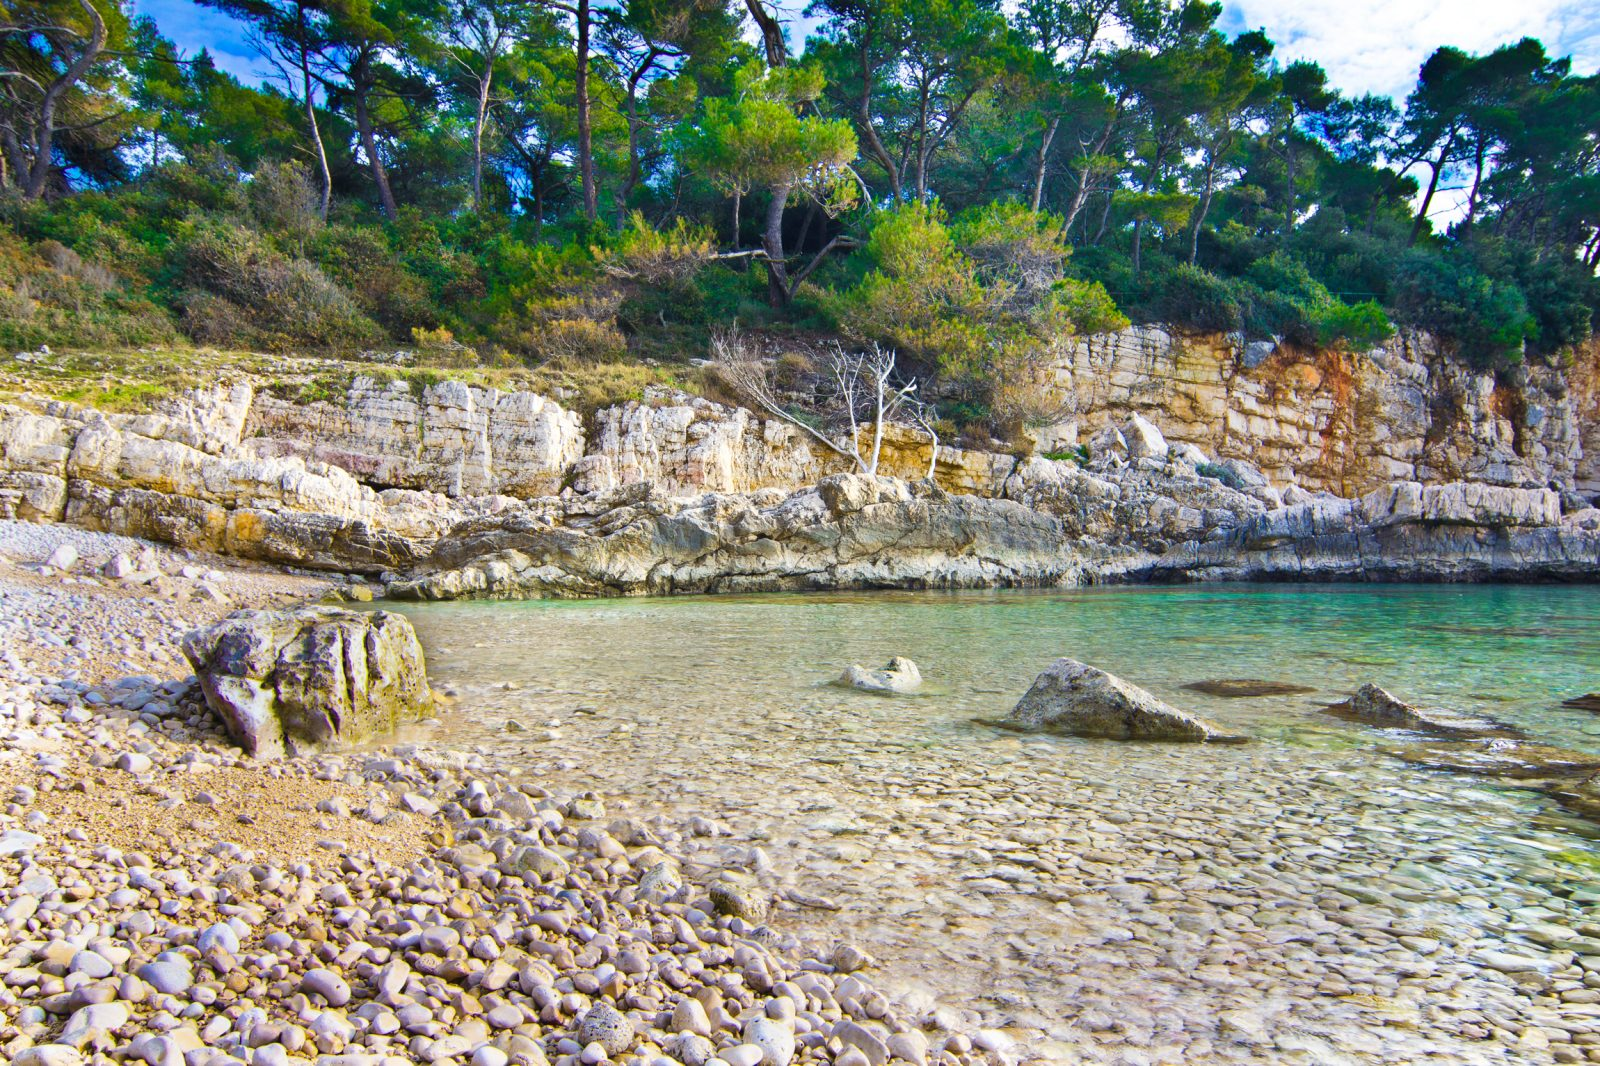 HIDDEN BEACH SURROUNDED BY ROCKS - GALEBOVE STIJENE IN PULA